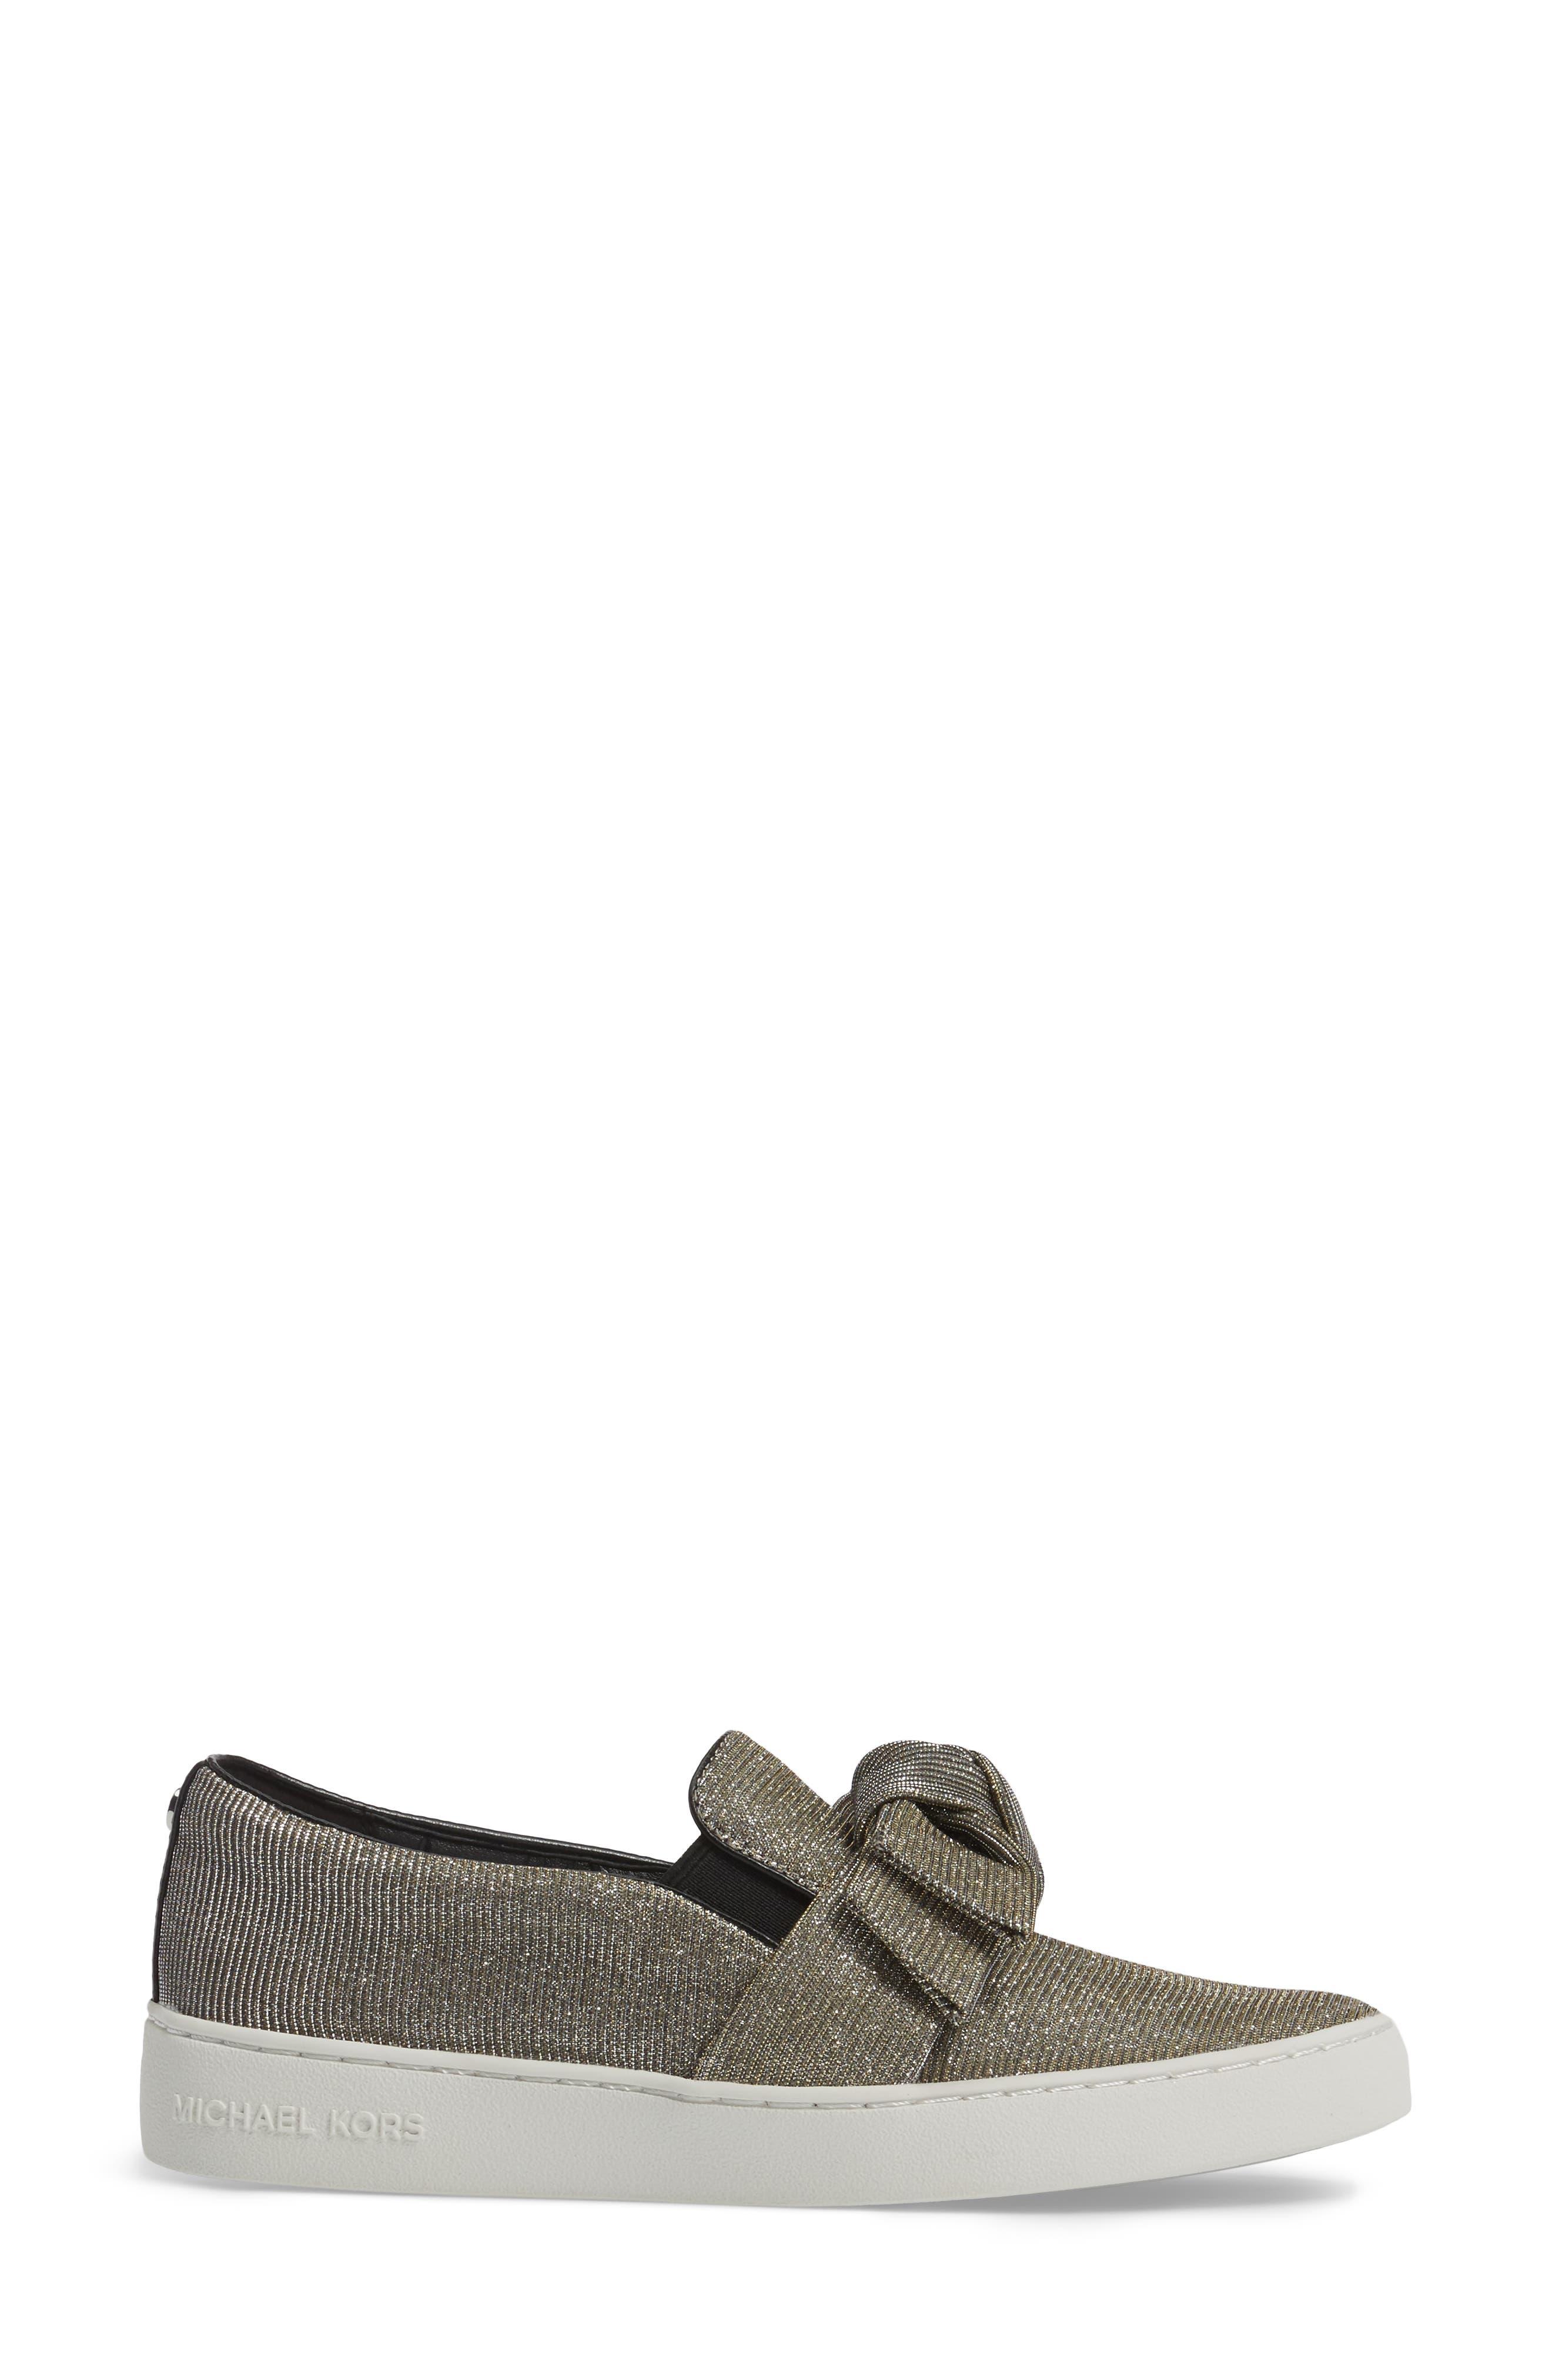 Willa Sneaker,                             Alternate thumbnail 14, color,